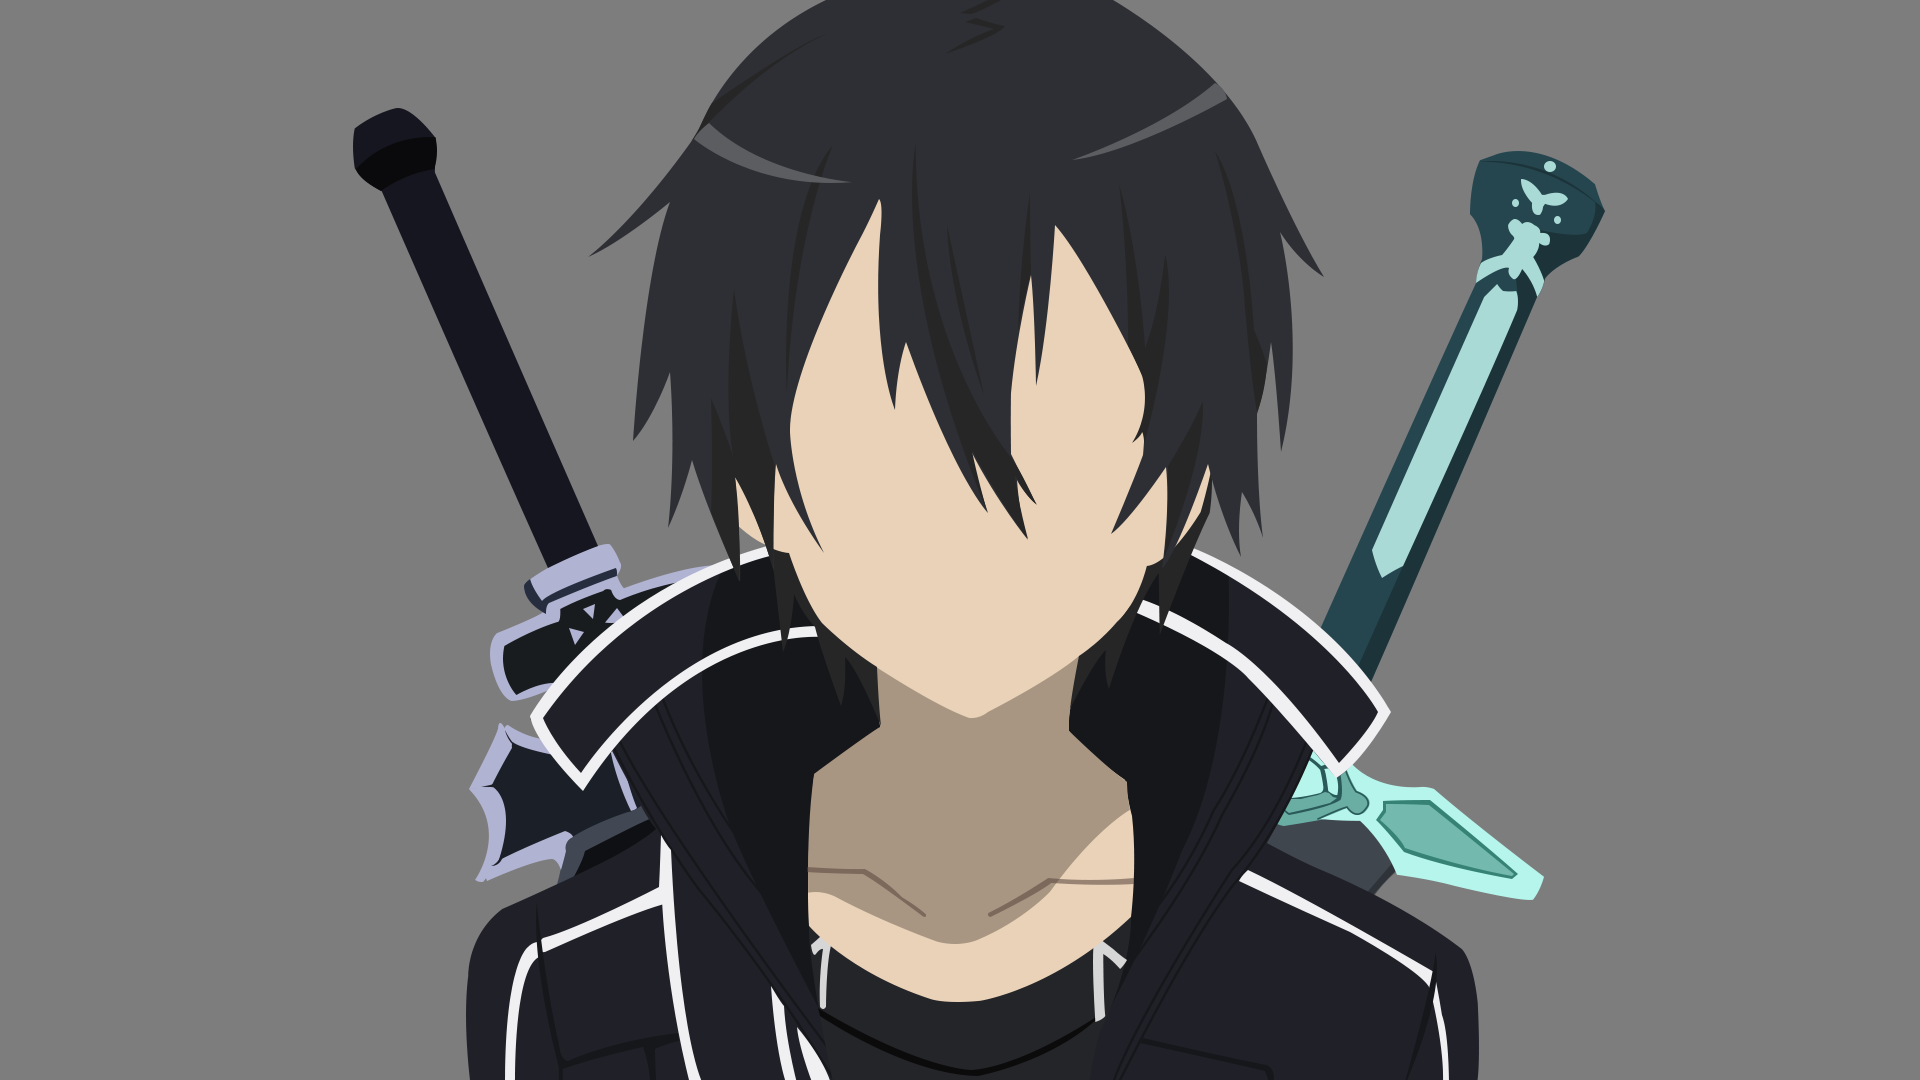 Kirito sao arc sword art online by cahyovon on deviantart for Minimal art online